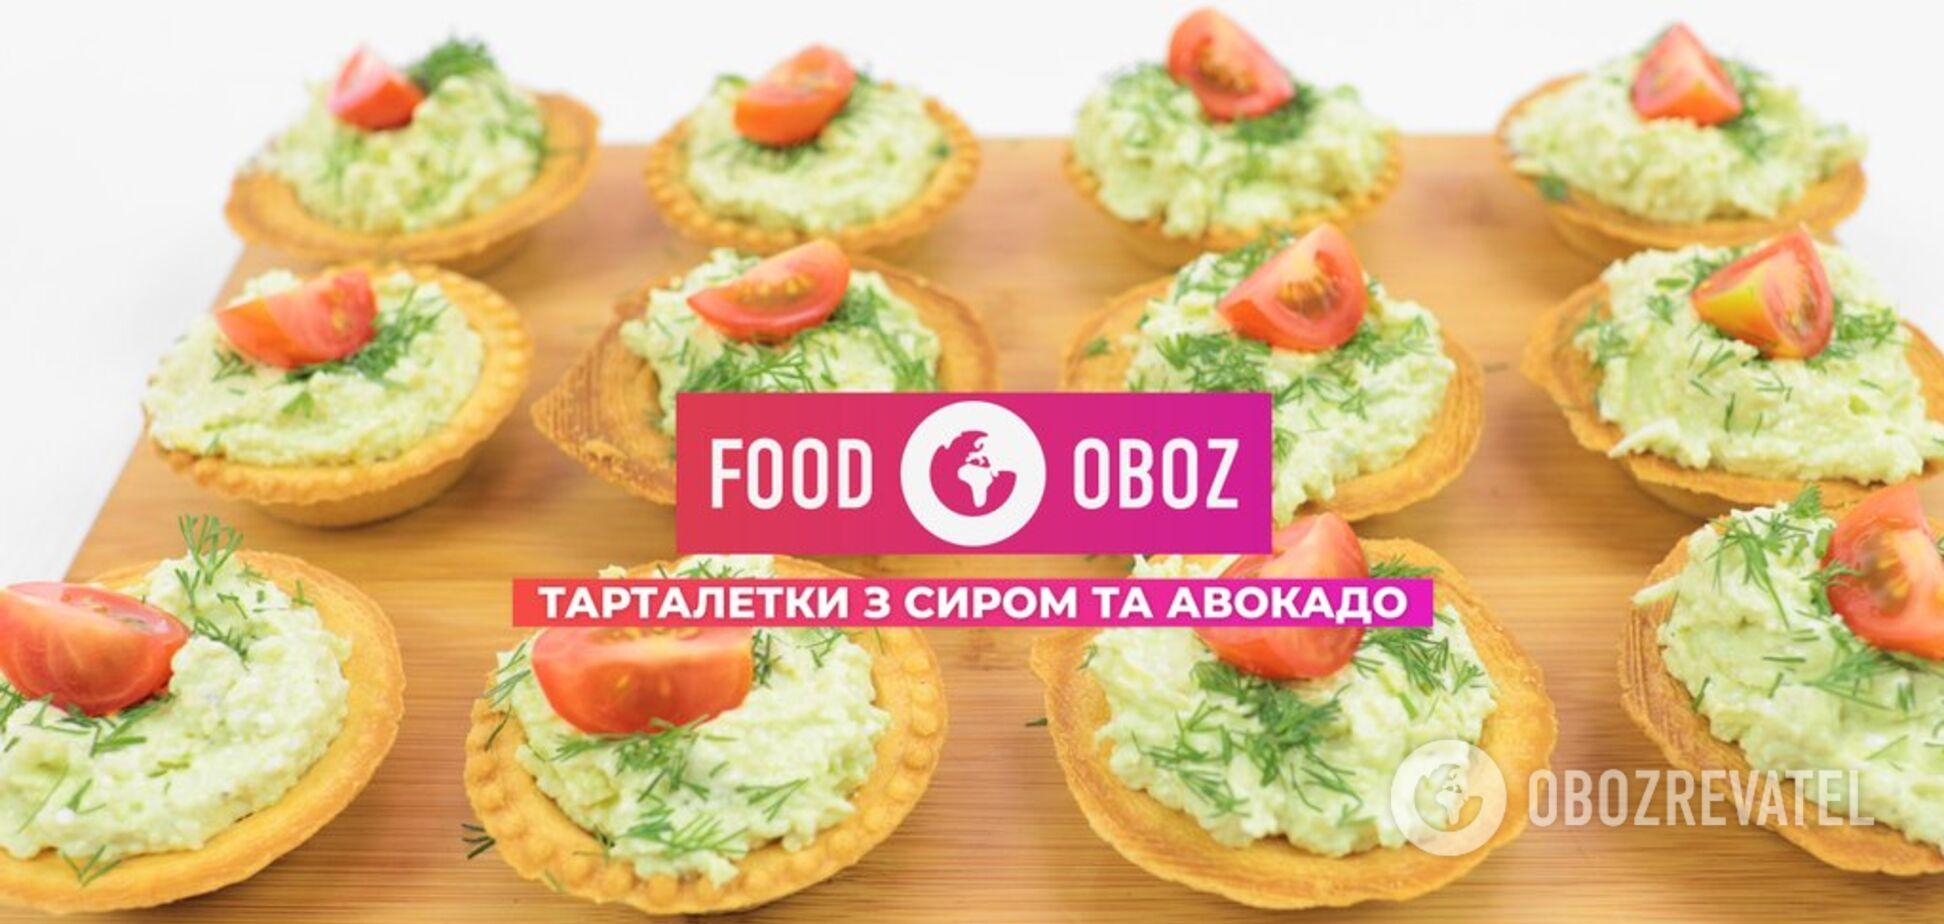 FOODOBOZ | Тарталетки с сыром и авокадо